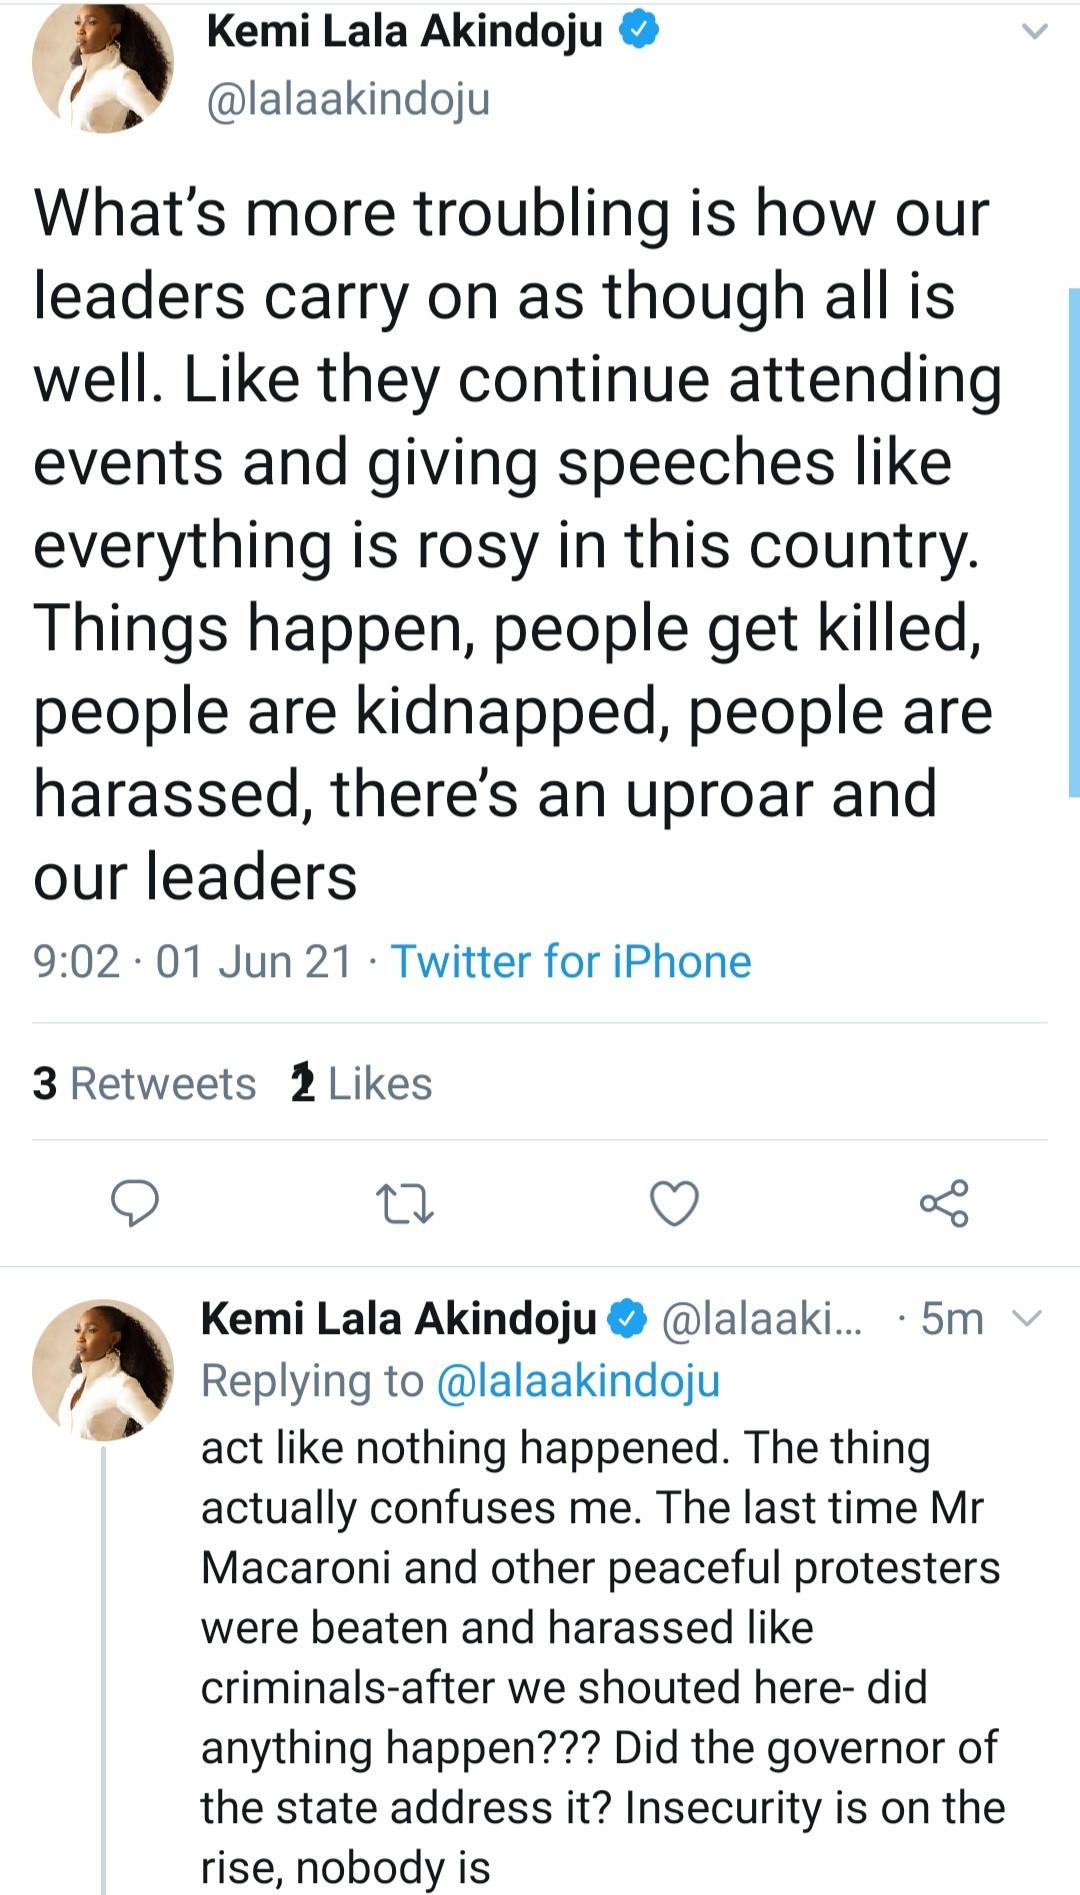 Lala Akindoju criticizes Nigerian leaders for their